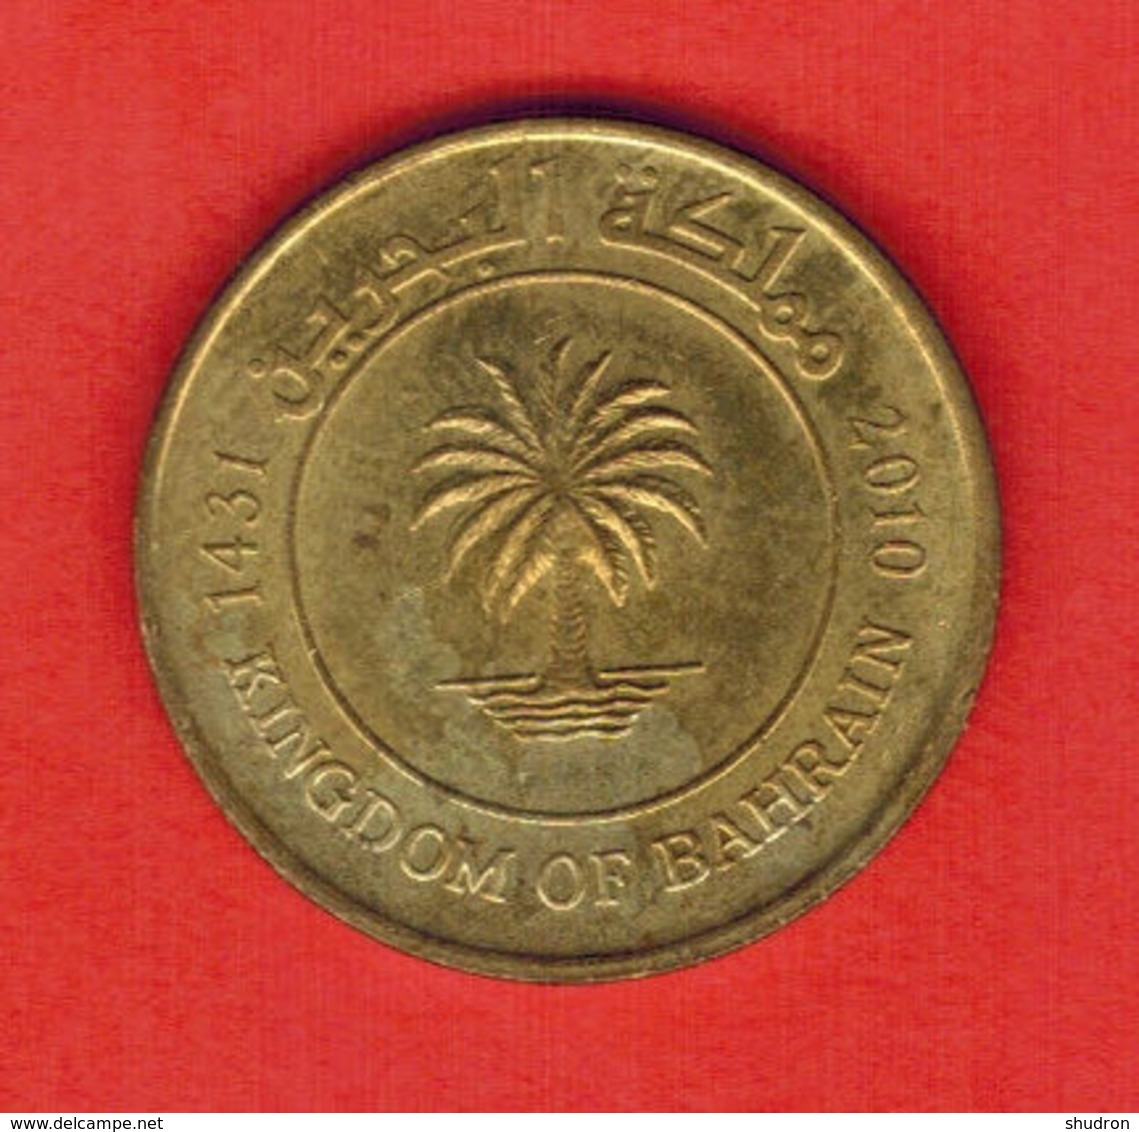 Bahrain 10 Fils, 1431 (2010) - Bahrein